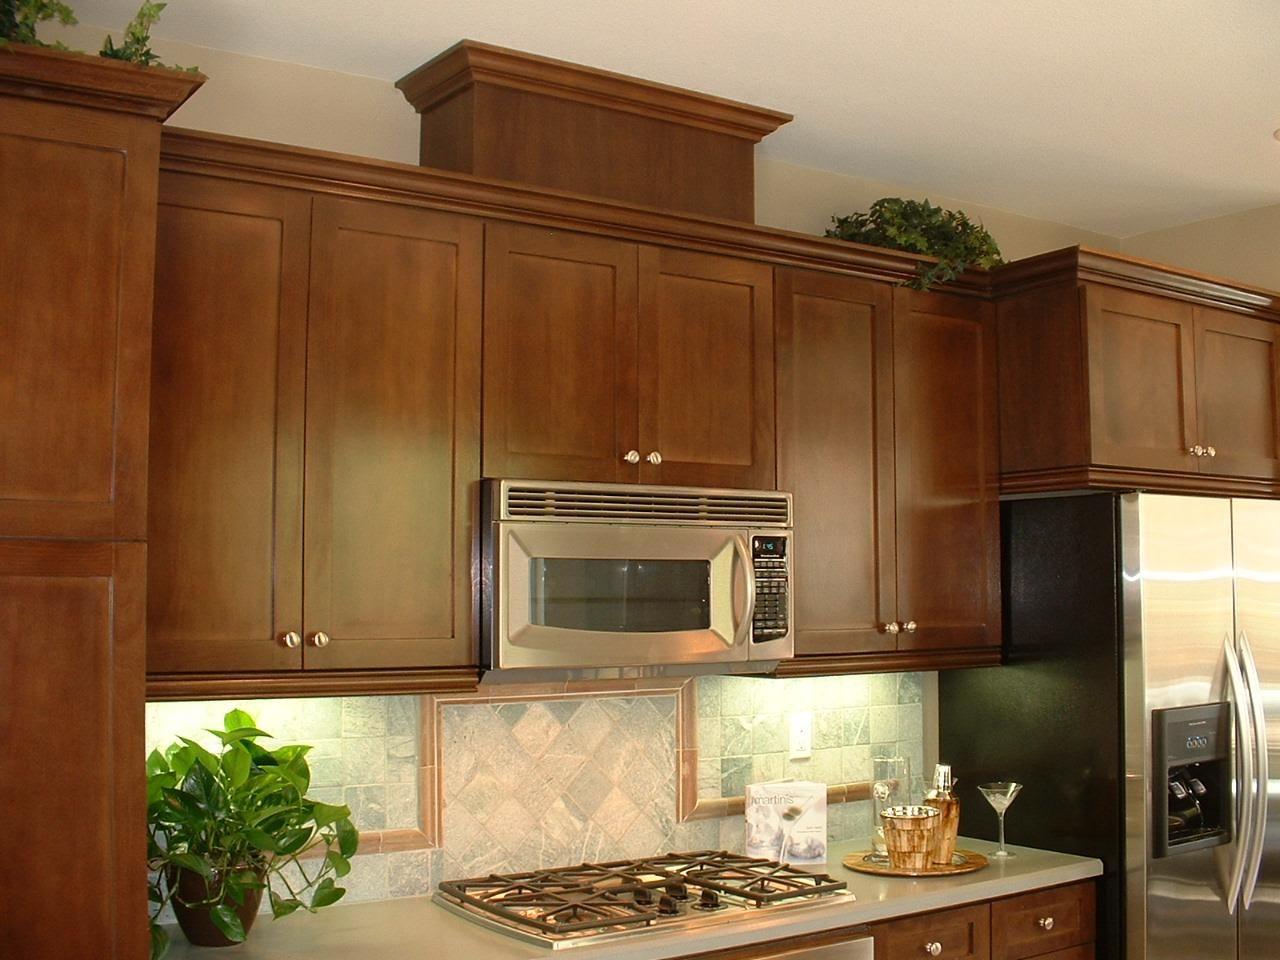 Honey Maple Shaker Kitchen Cabinets   Google Search